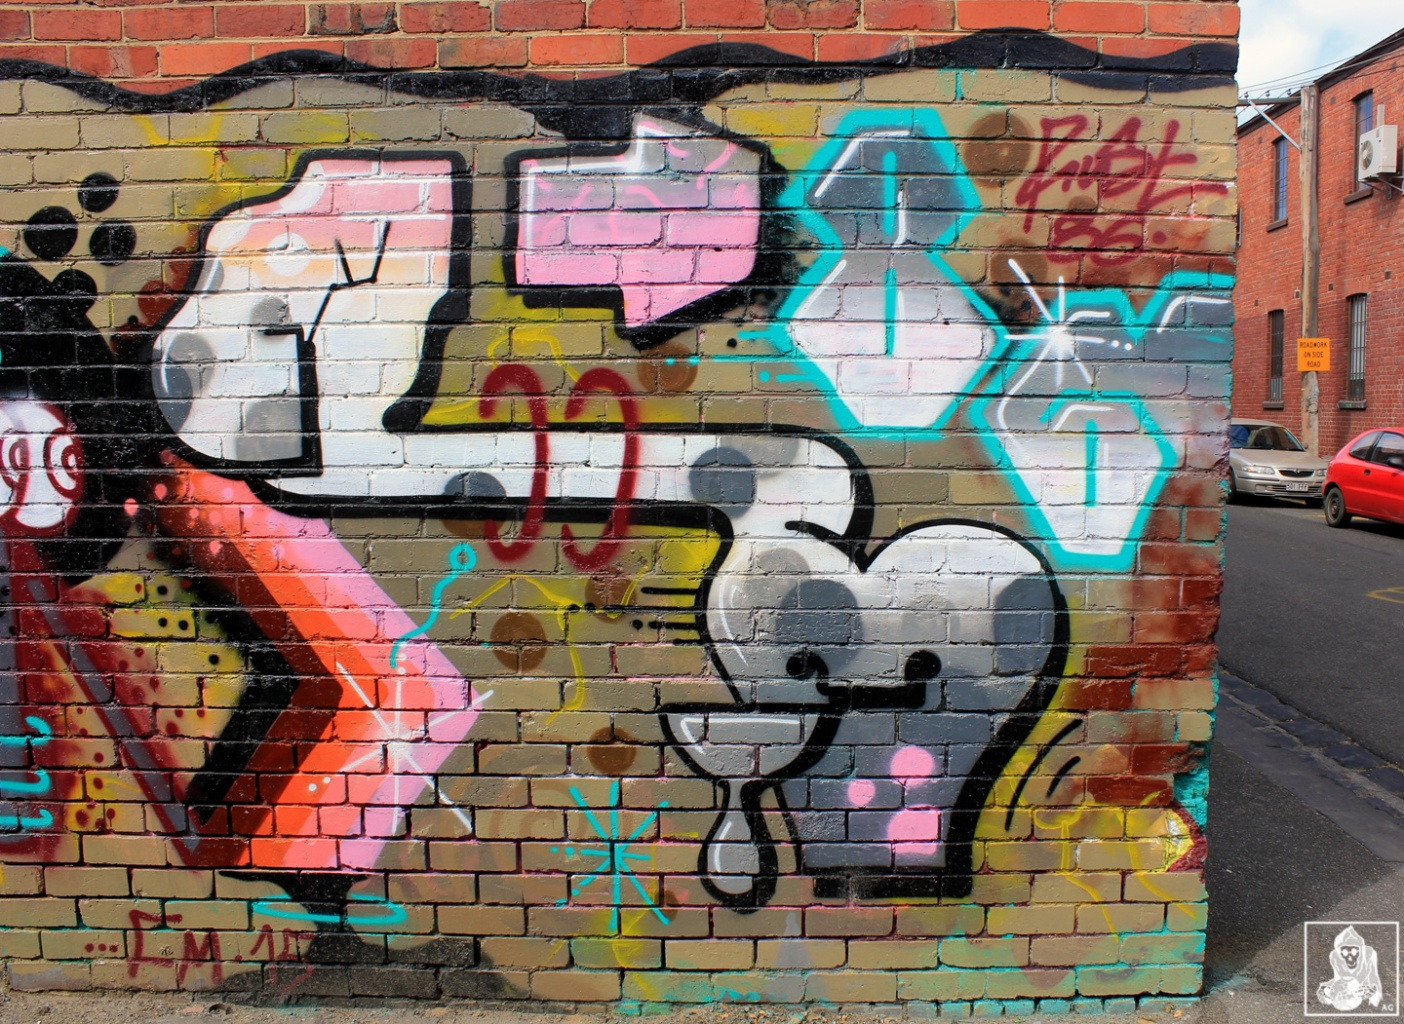 H20e-Rust86-Fitzroy-Graffiti-Melbourne-Arty-Graffarti5